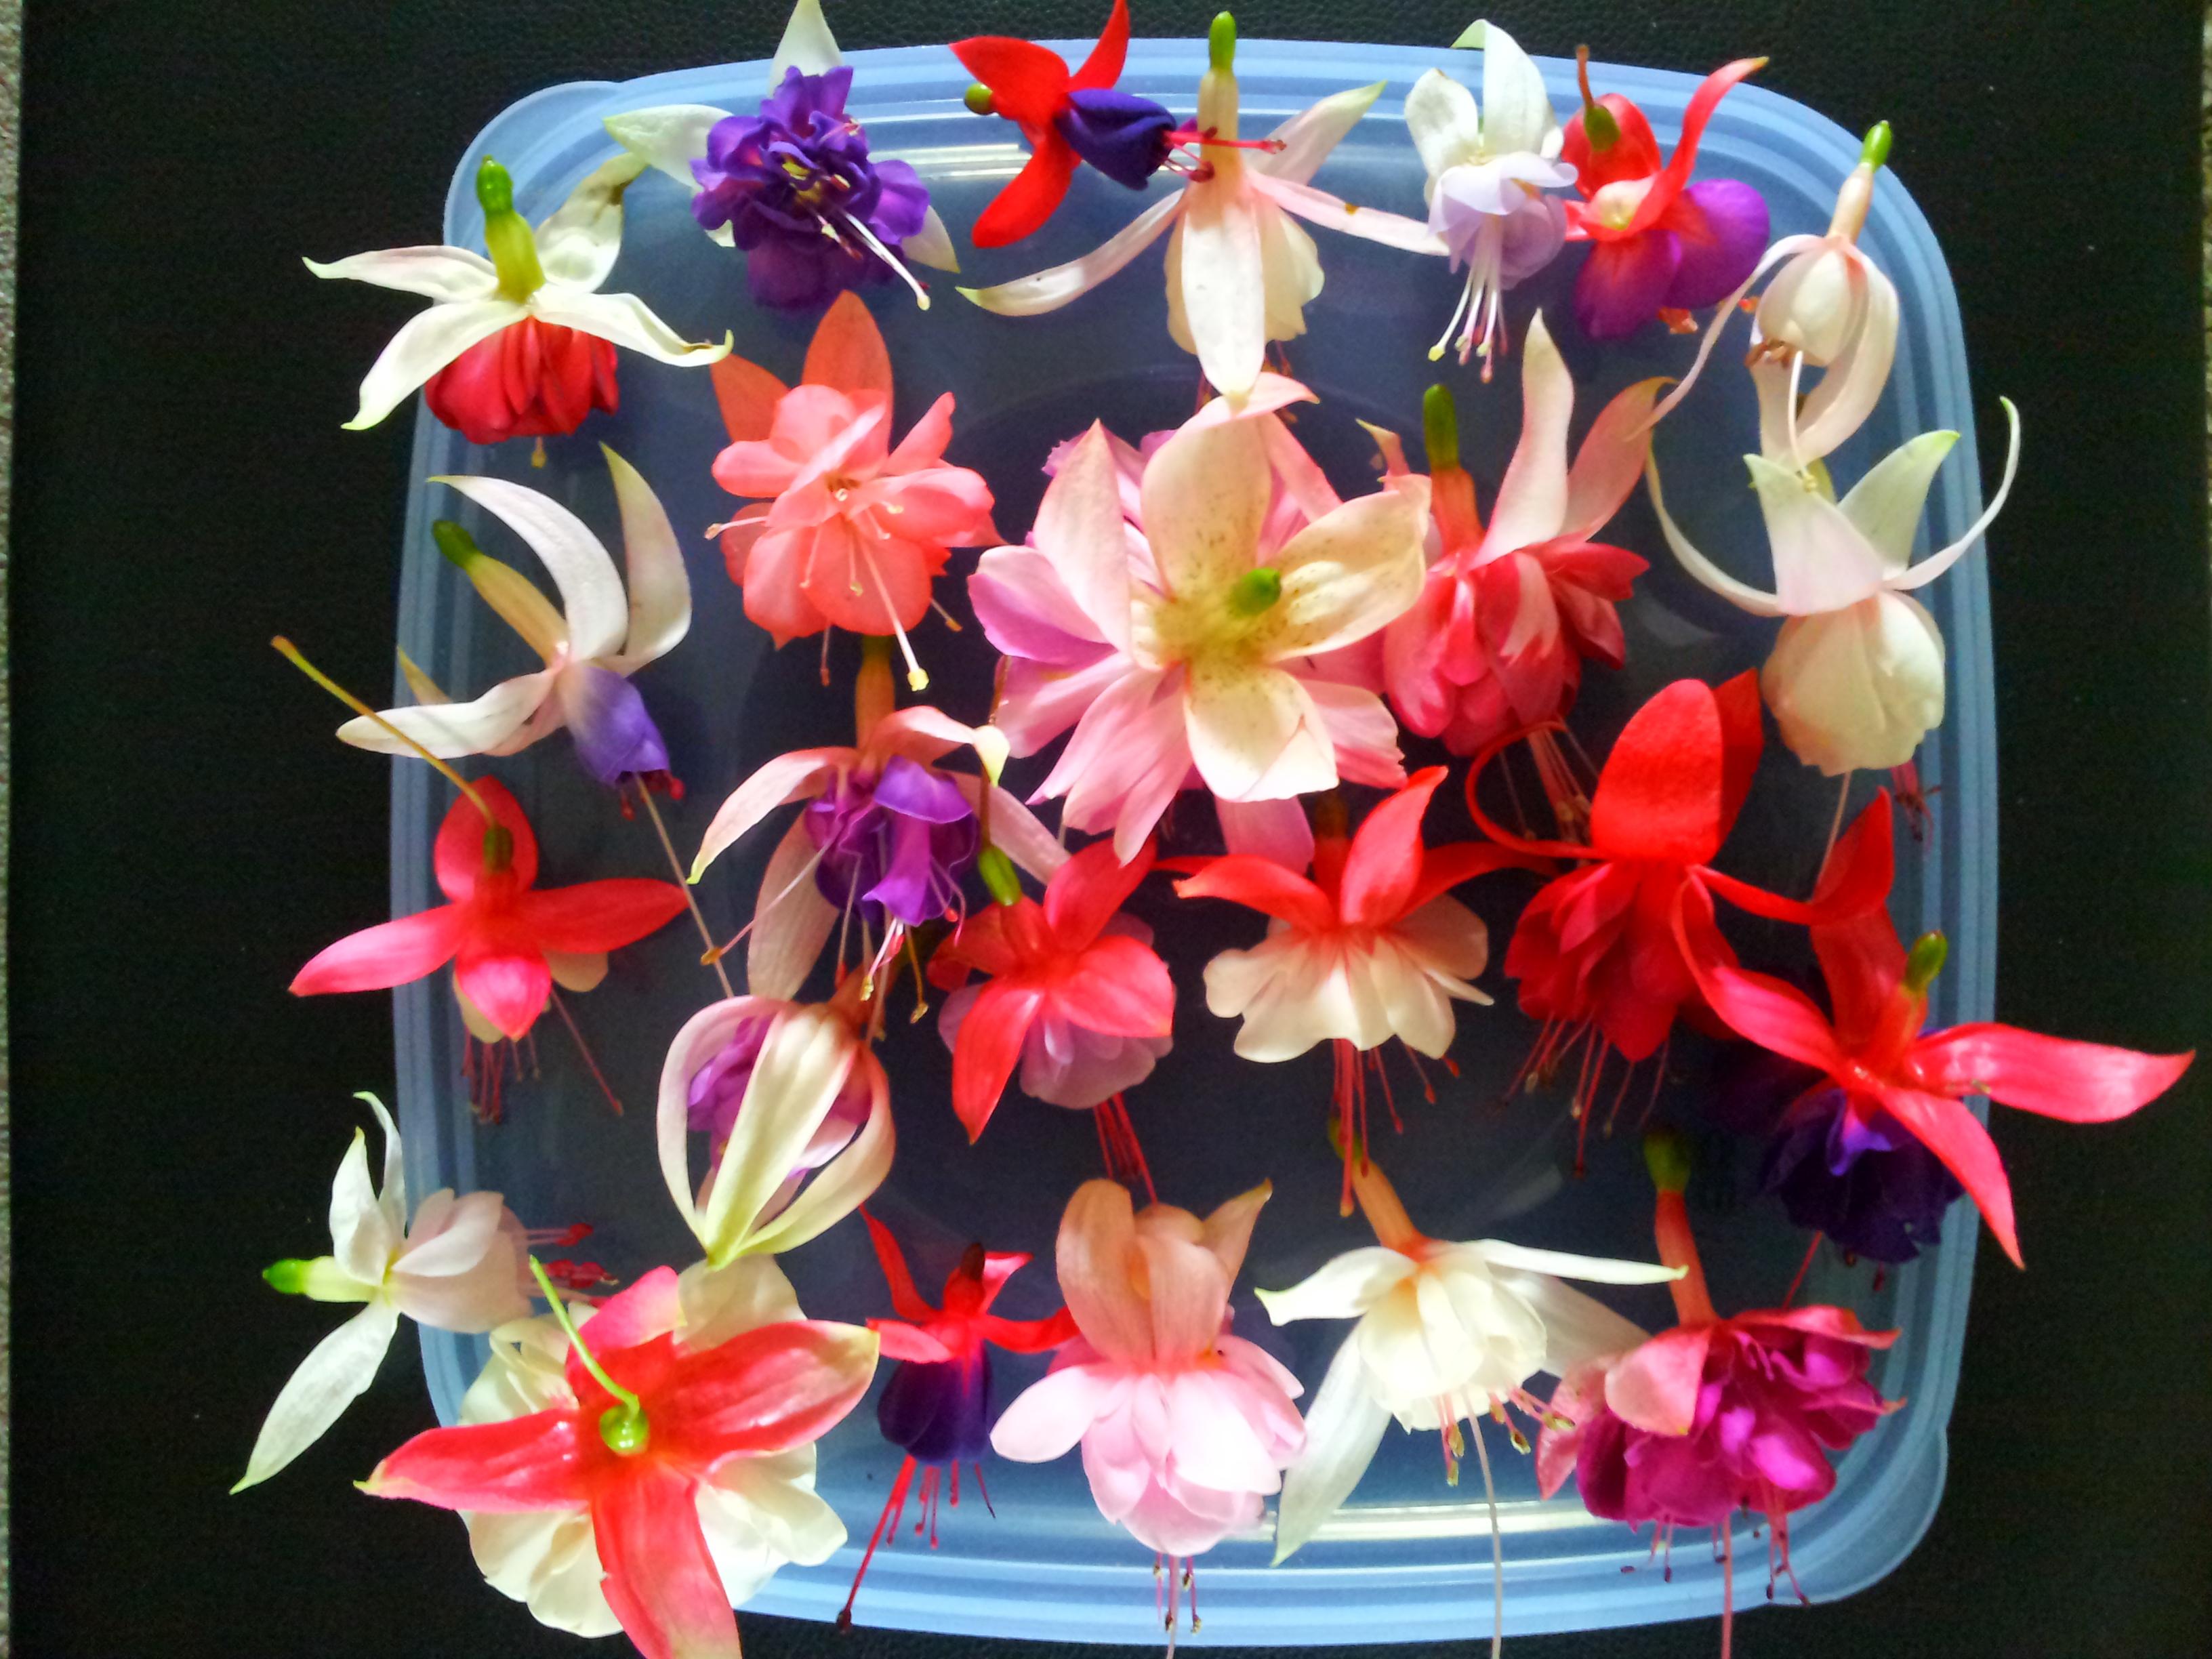 Fuchsias - Bundle Packs & Gifts